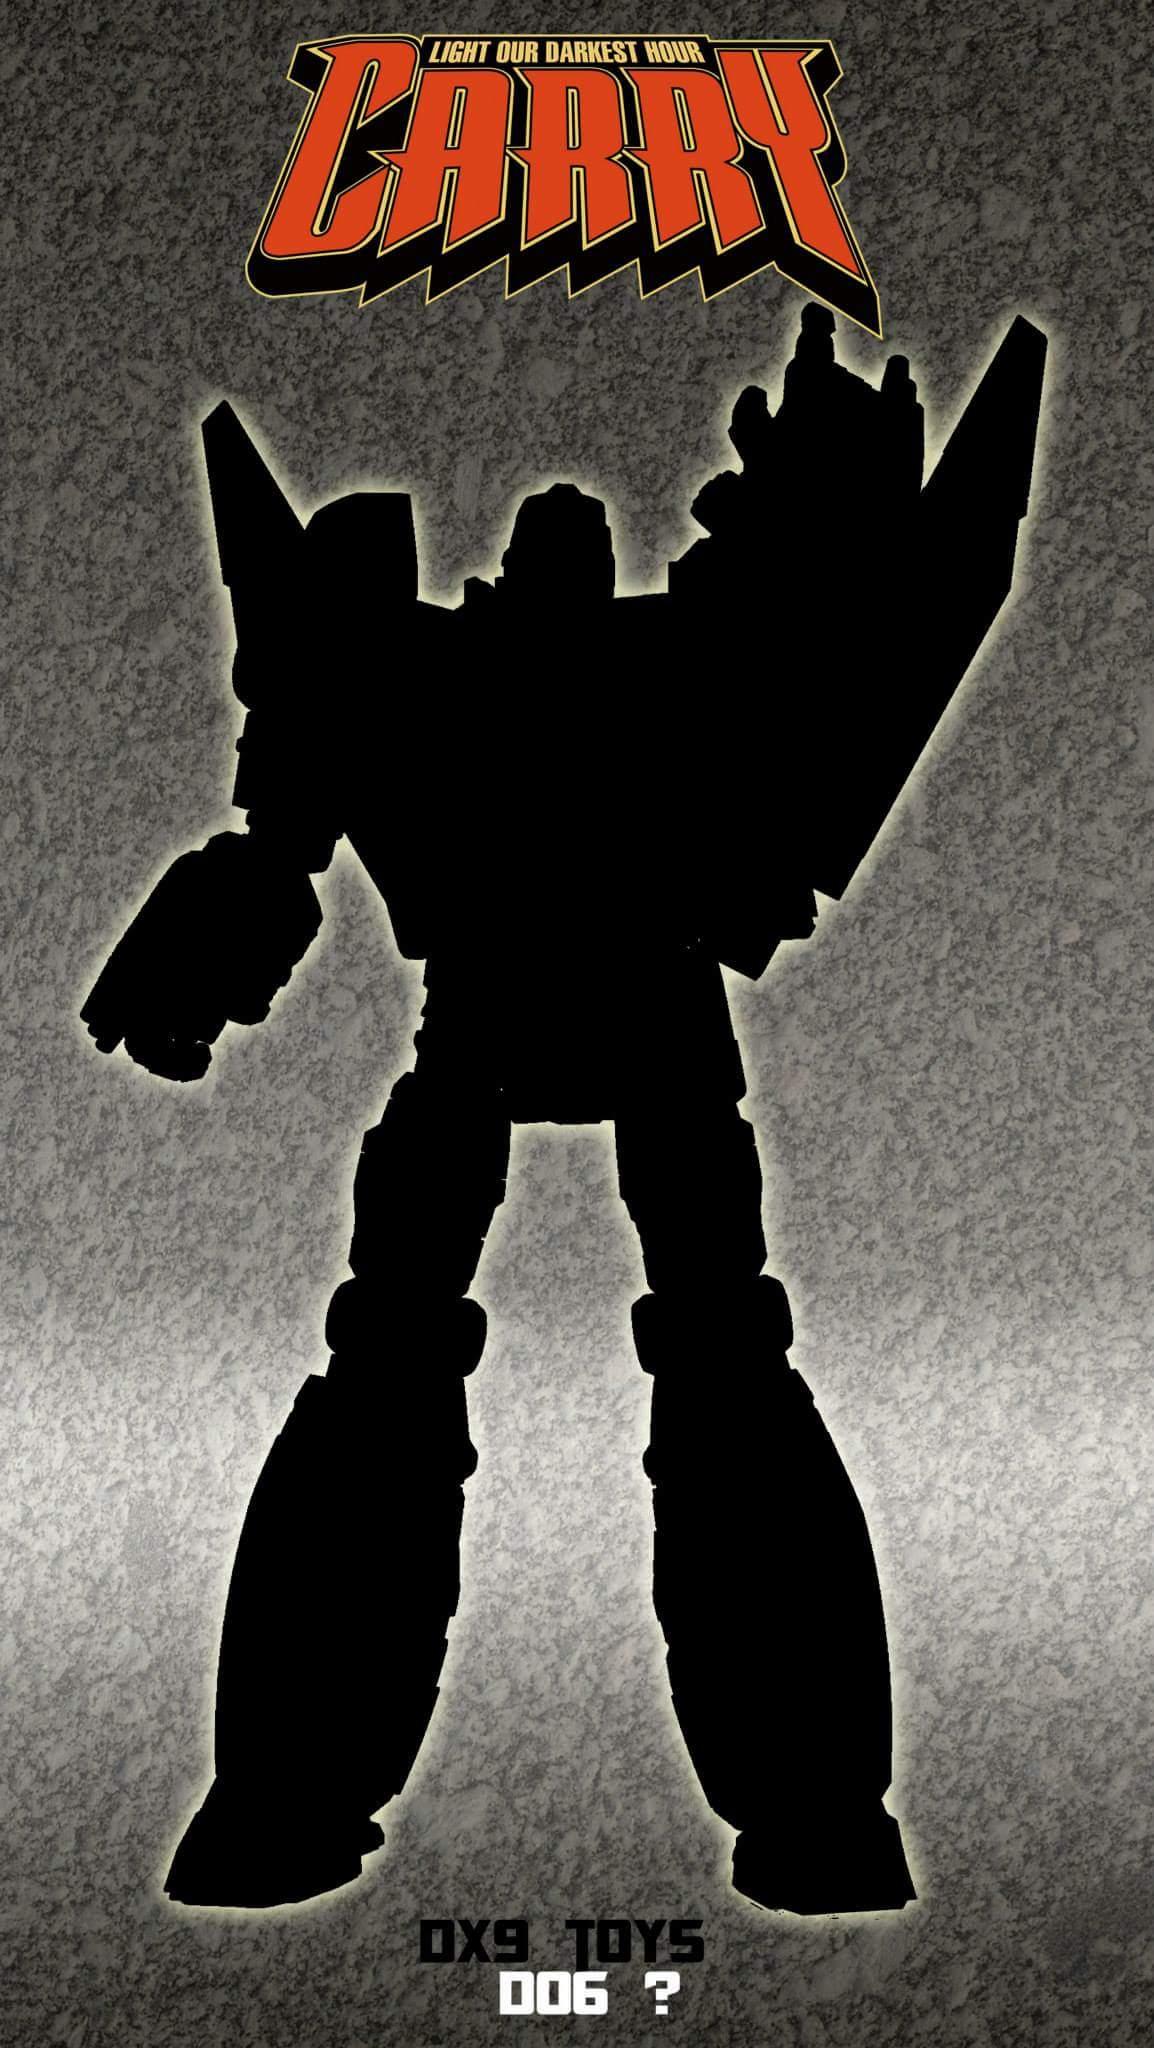 [DX9 Toys] Produit Tiers - Jouet D-06 Carry aka Rodimus et D-06T Terror aka Black Rodimus U6nDtBkQ